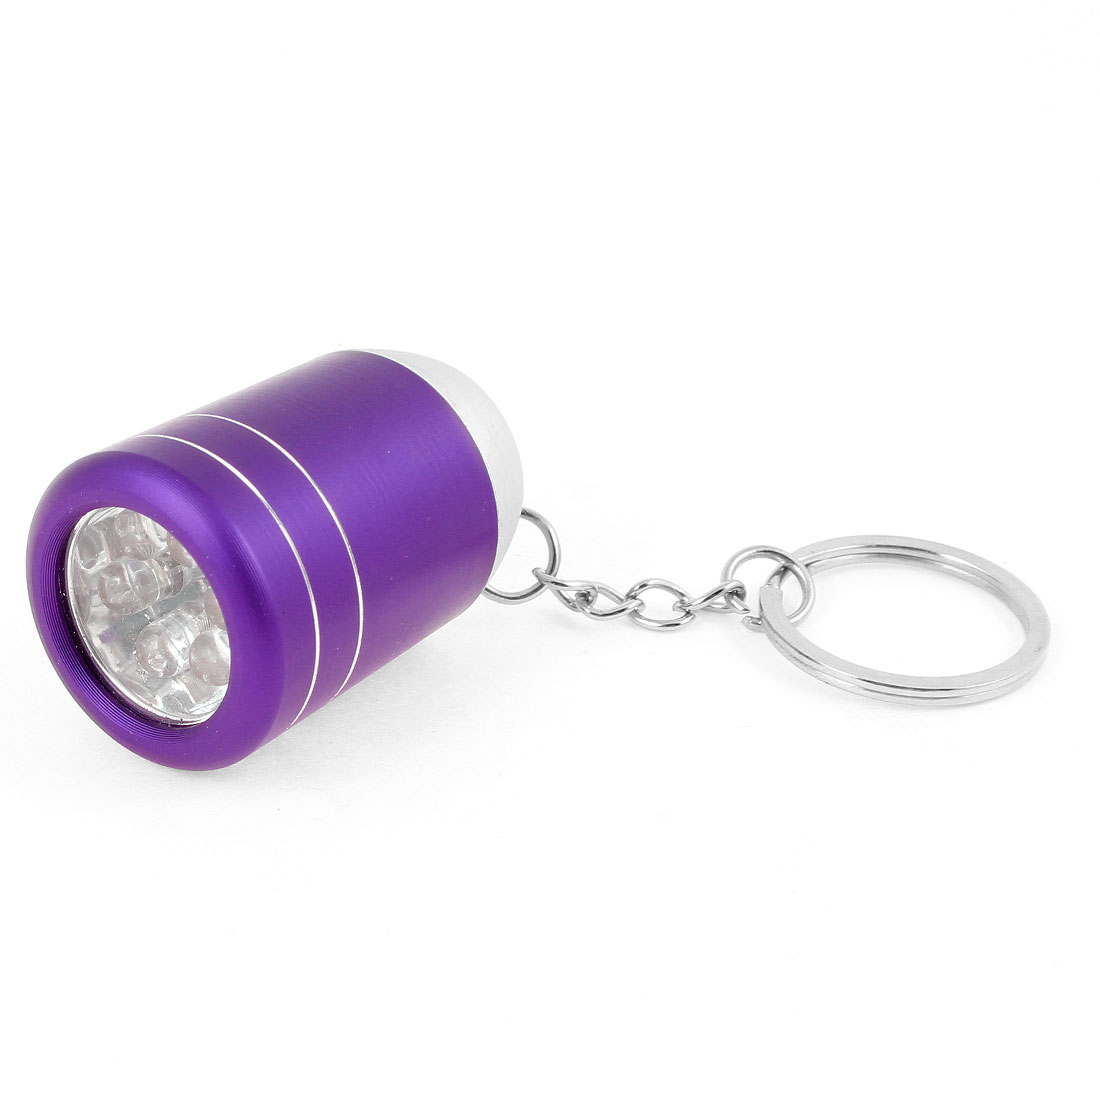 Purple Alloy Shell 6 LED White Light Flashlight Torch Lamp + Keys Chain Ring